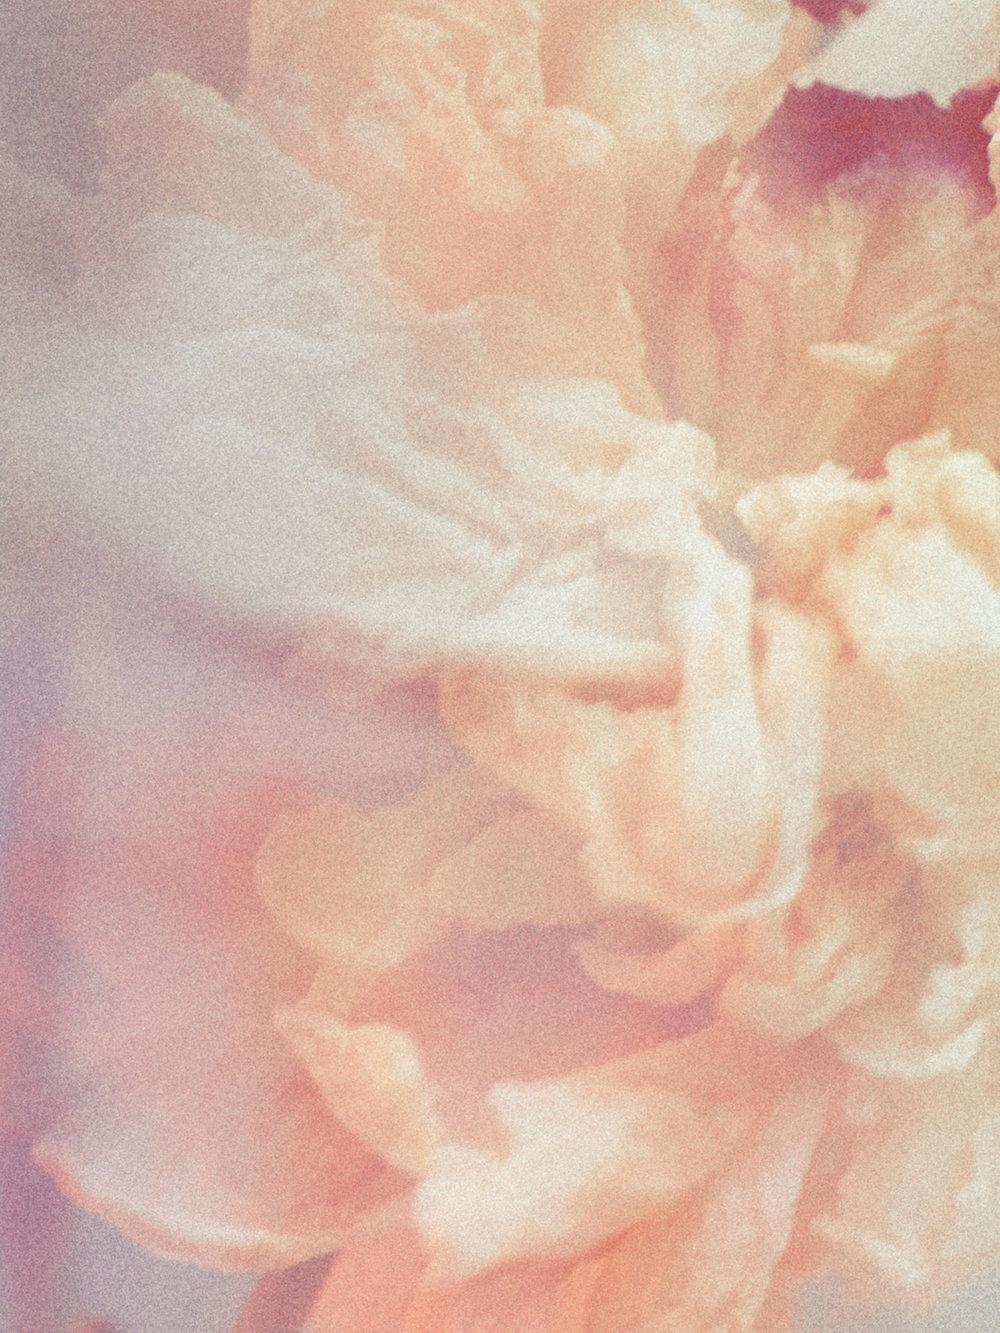 012-icon-artist-management-Kristin-Vicari-Girls and Flowers-12.jpg